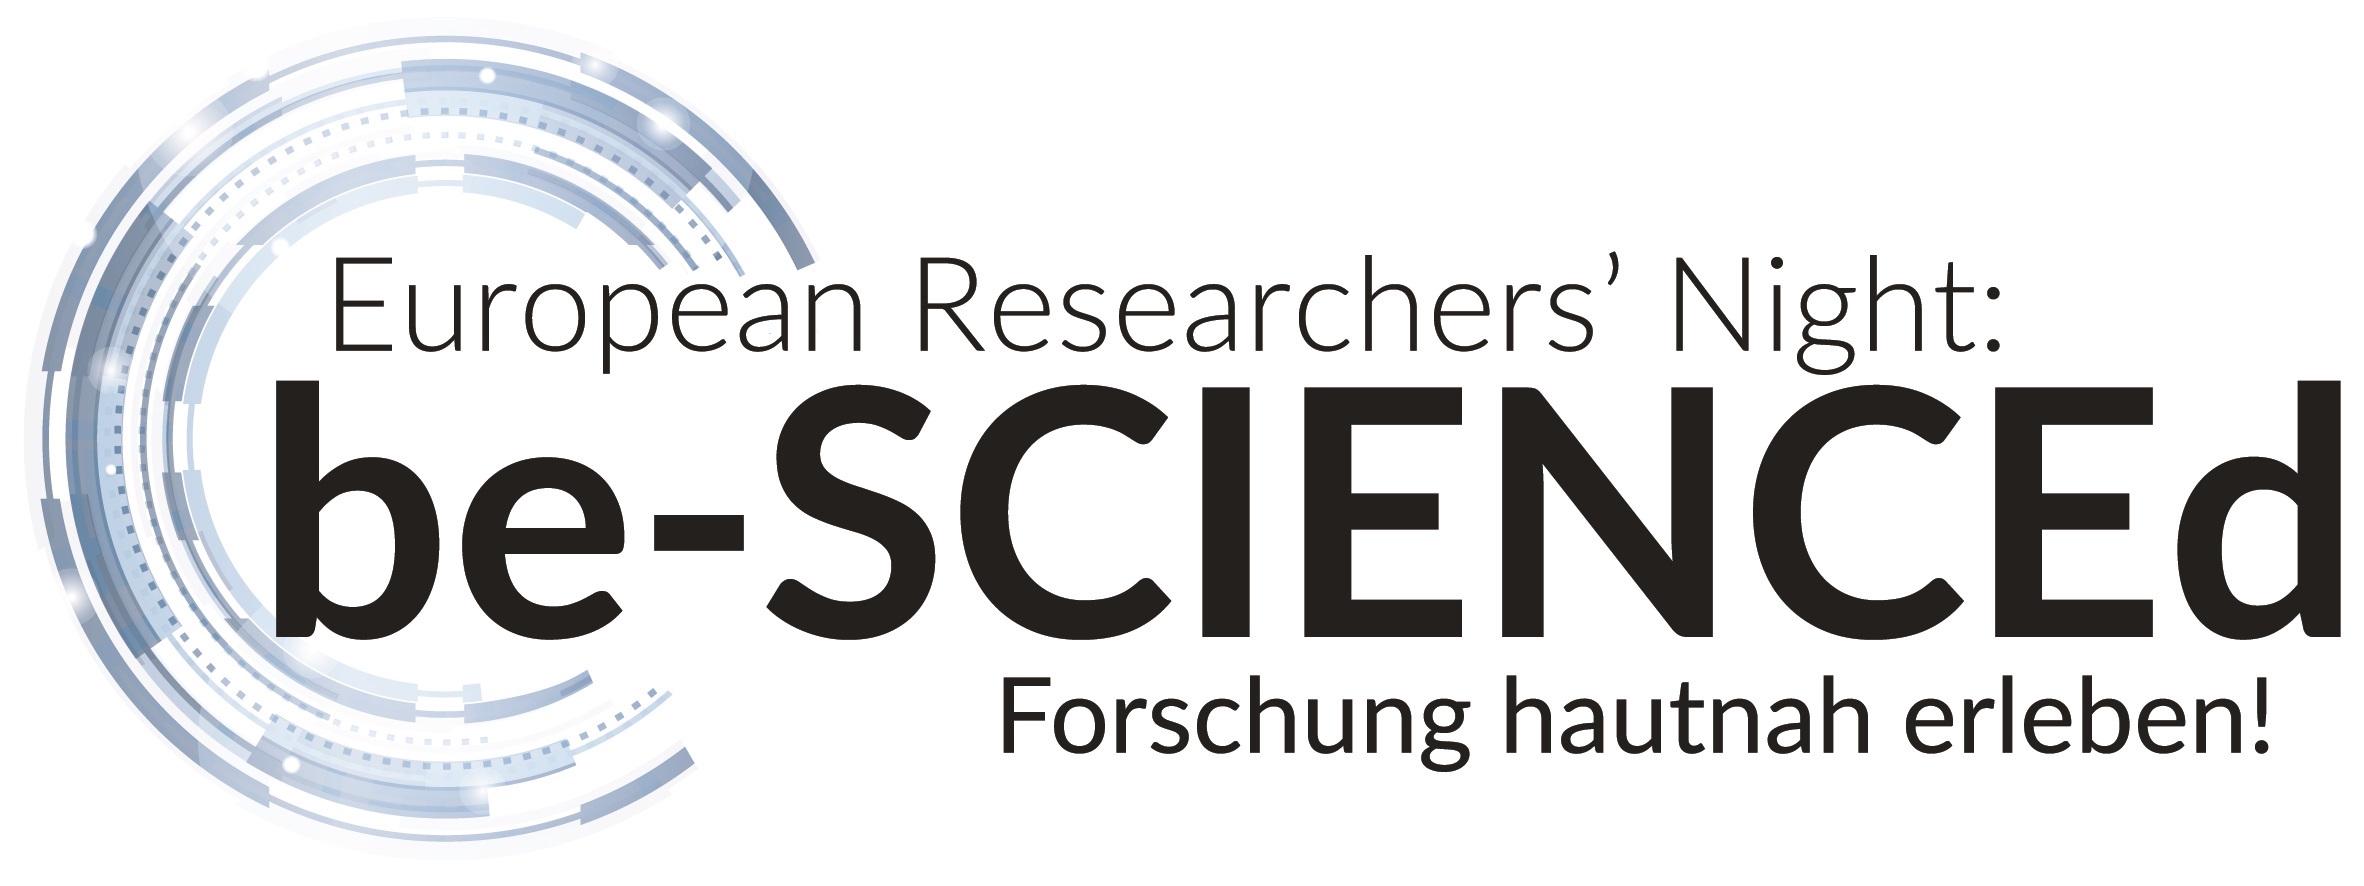 European Researchers Night